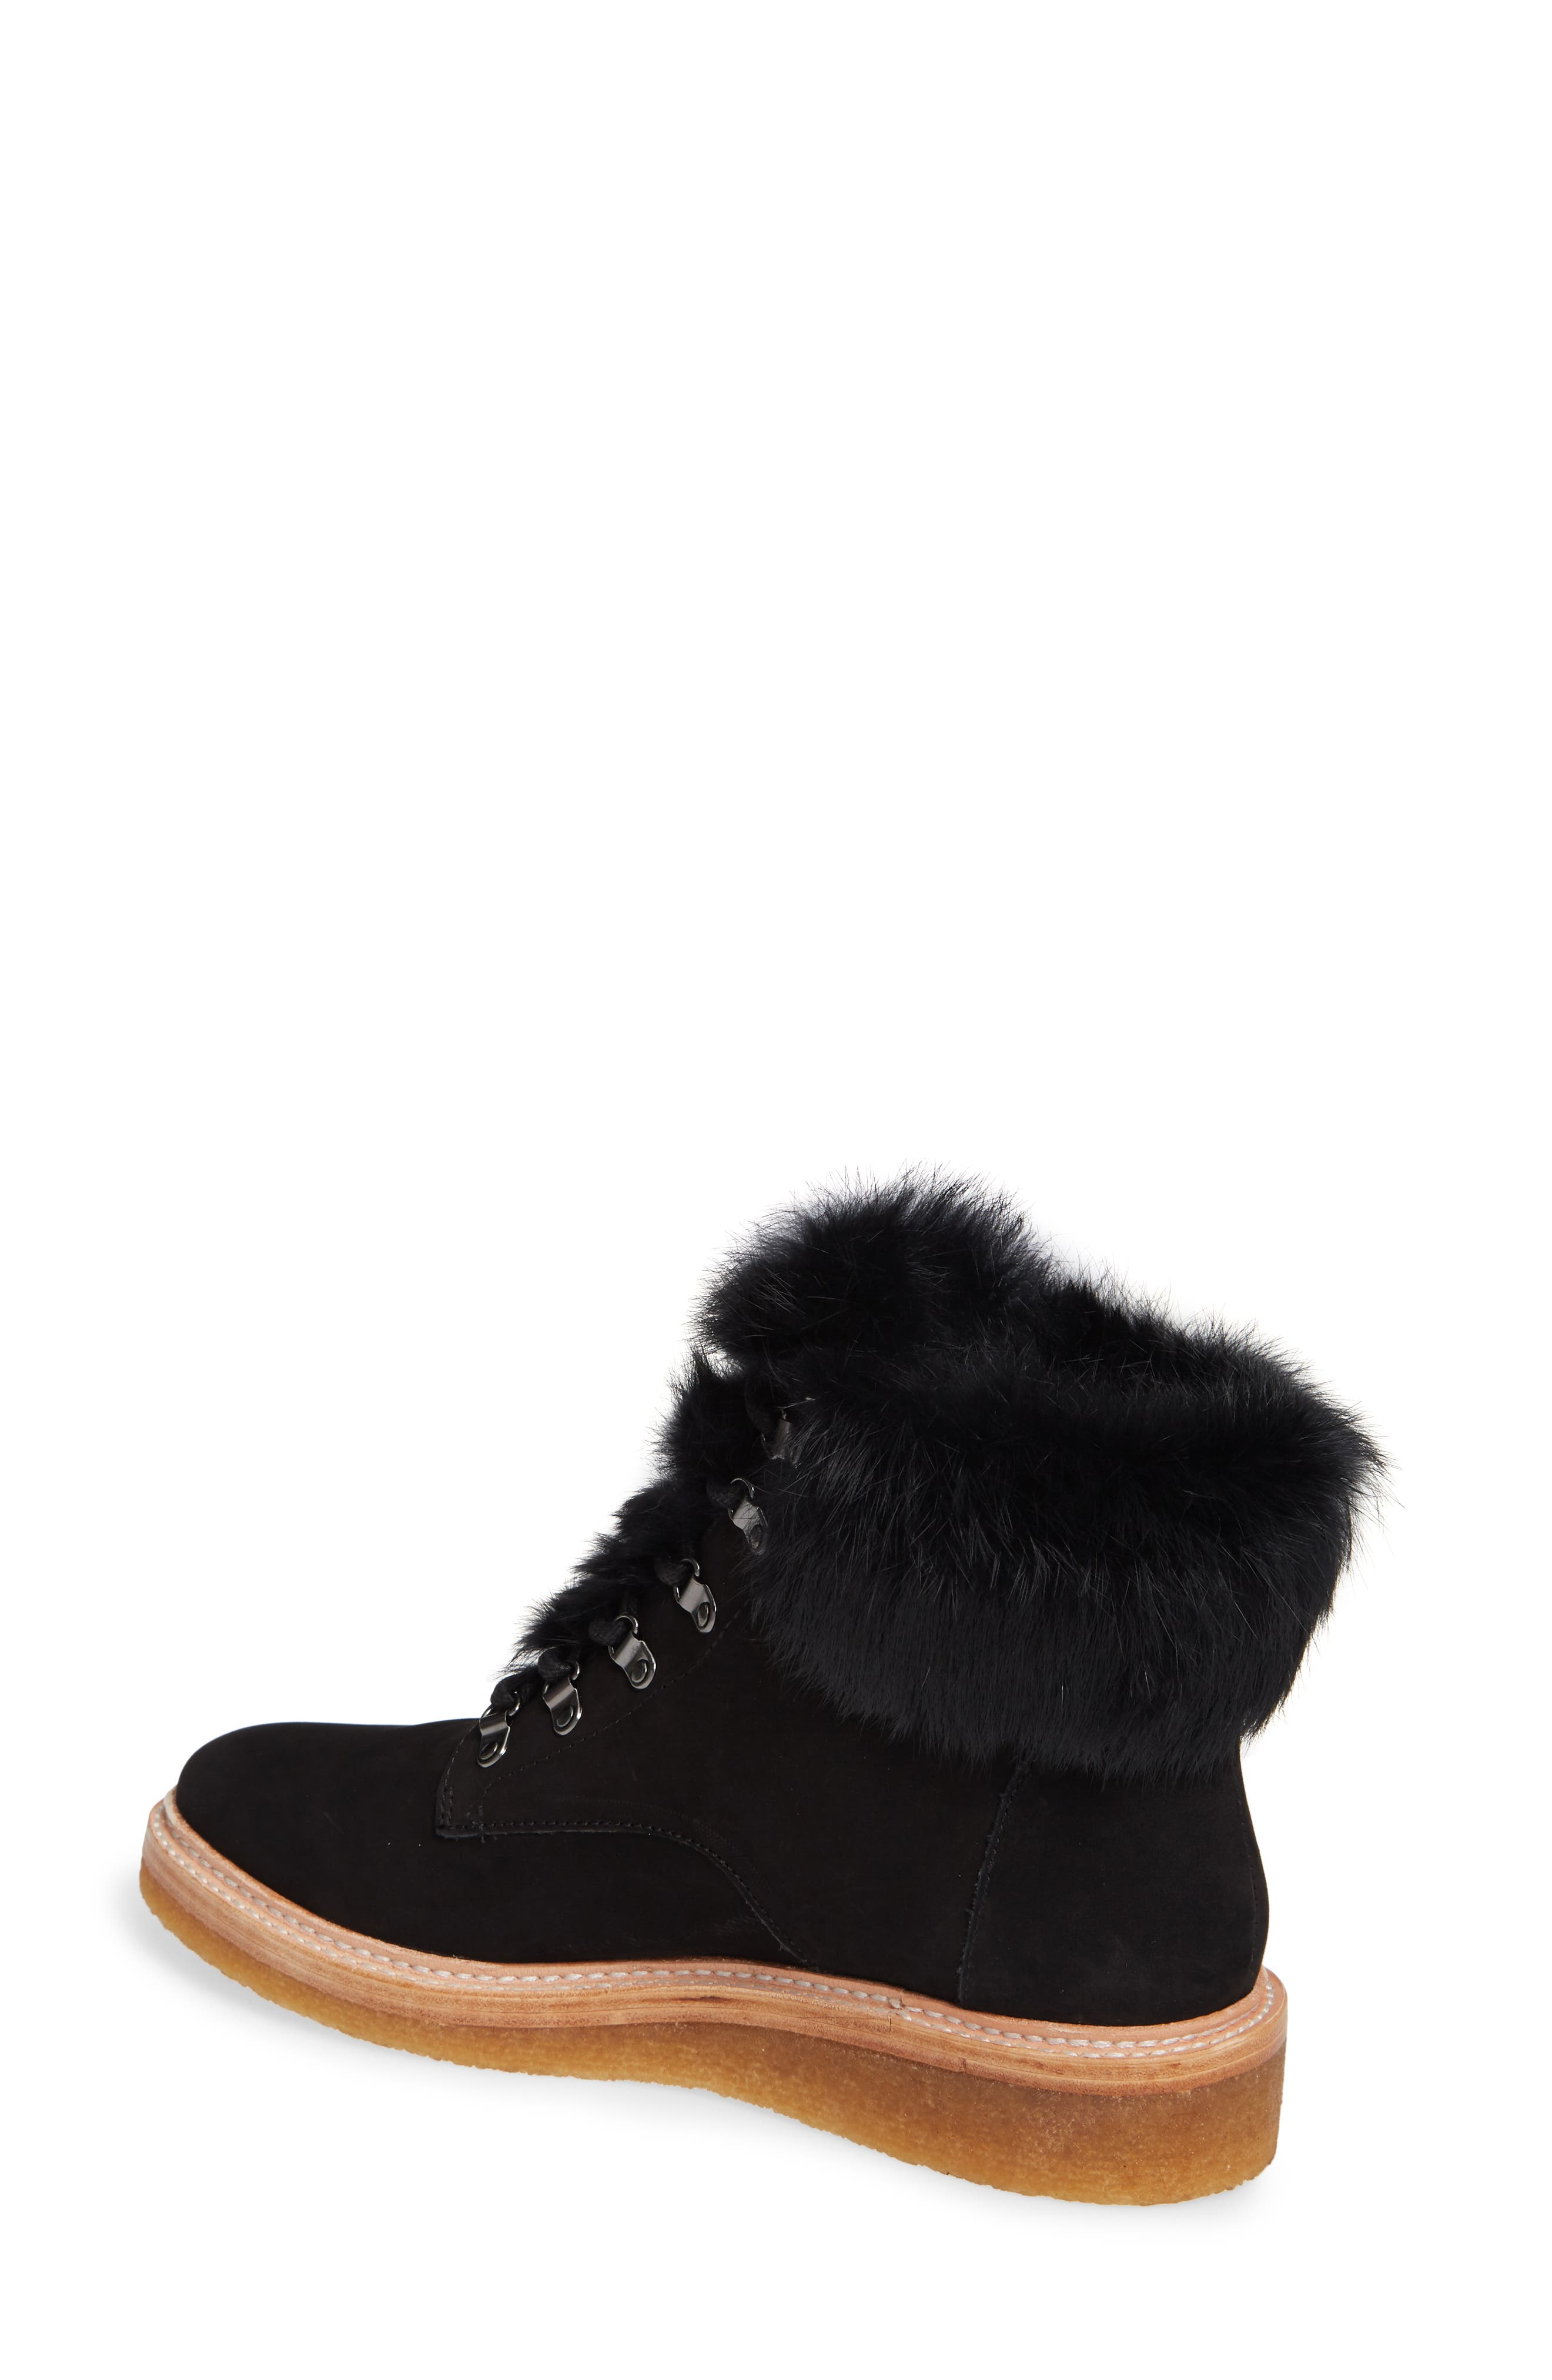 BOTKIER,                             Winter Genuine Rabbit Fur Trim Boot,                             Alternate thumbnail 2, color,                             BLACK SUEDE